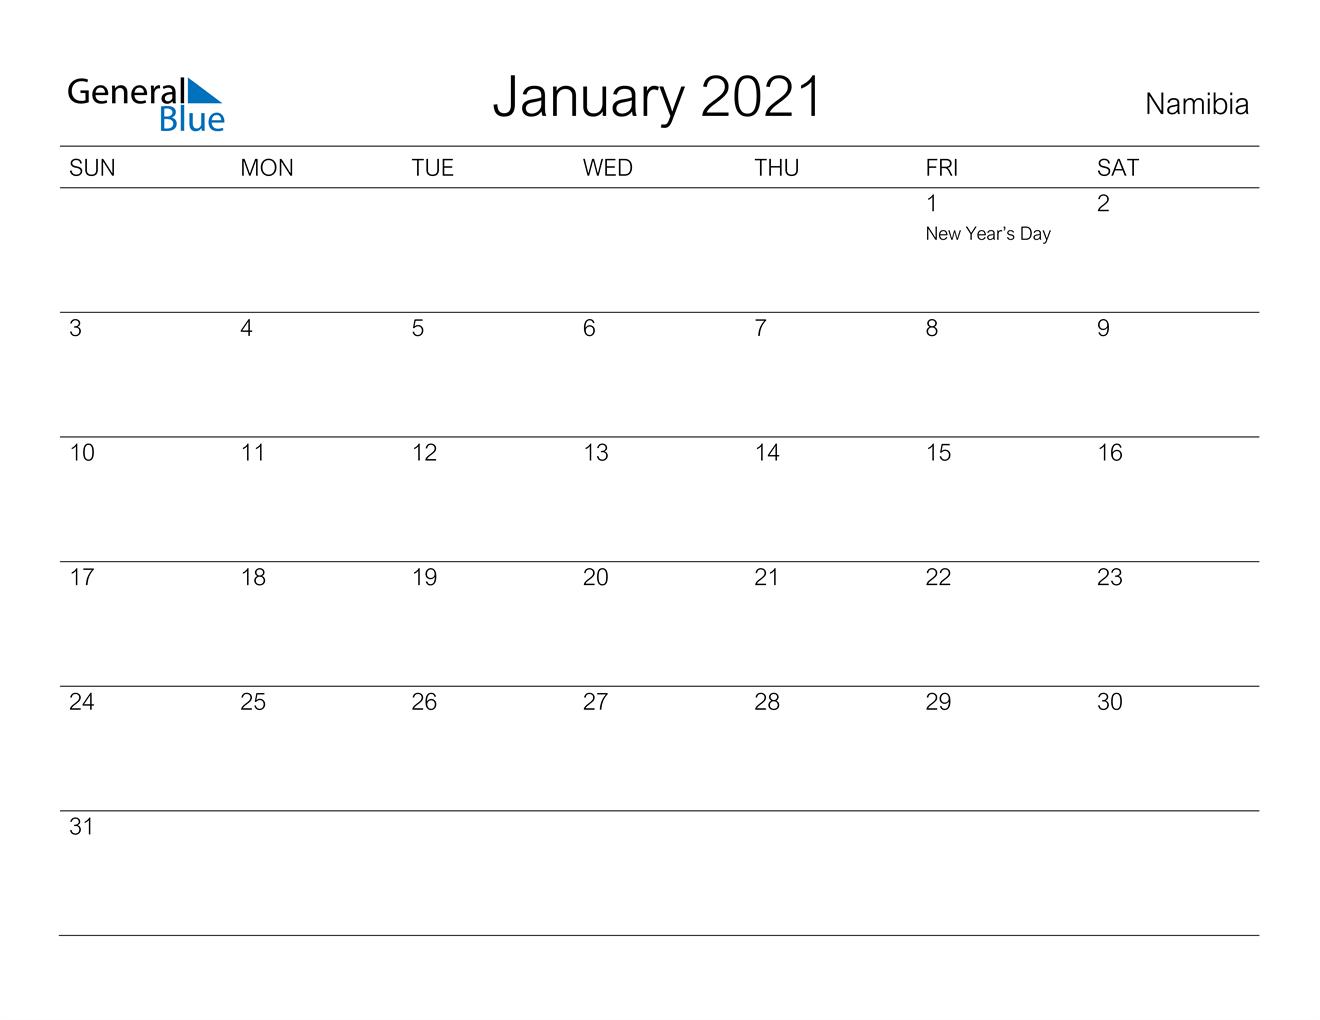 January 2021 Calendar - Namibia